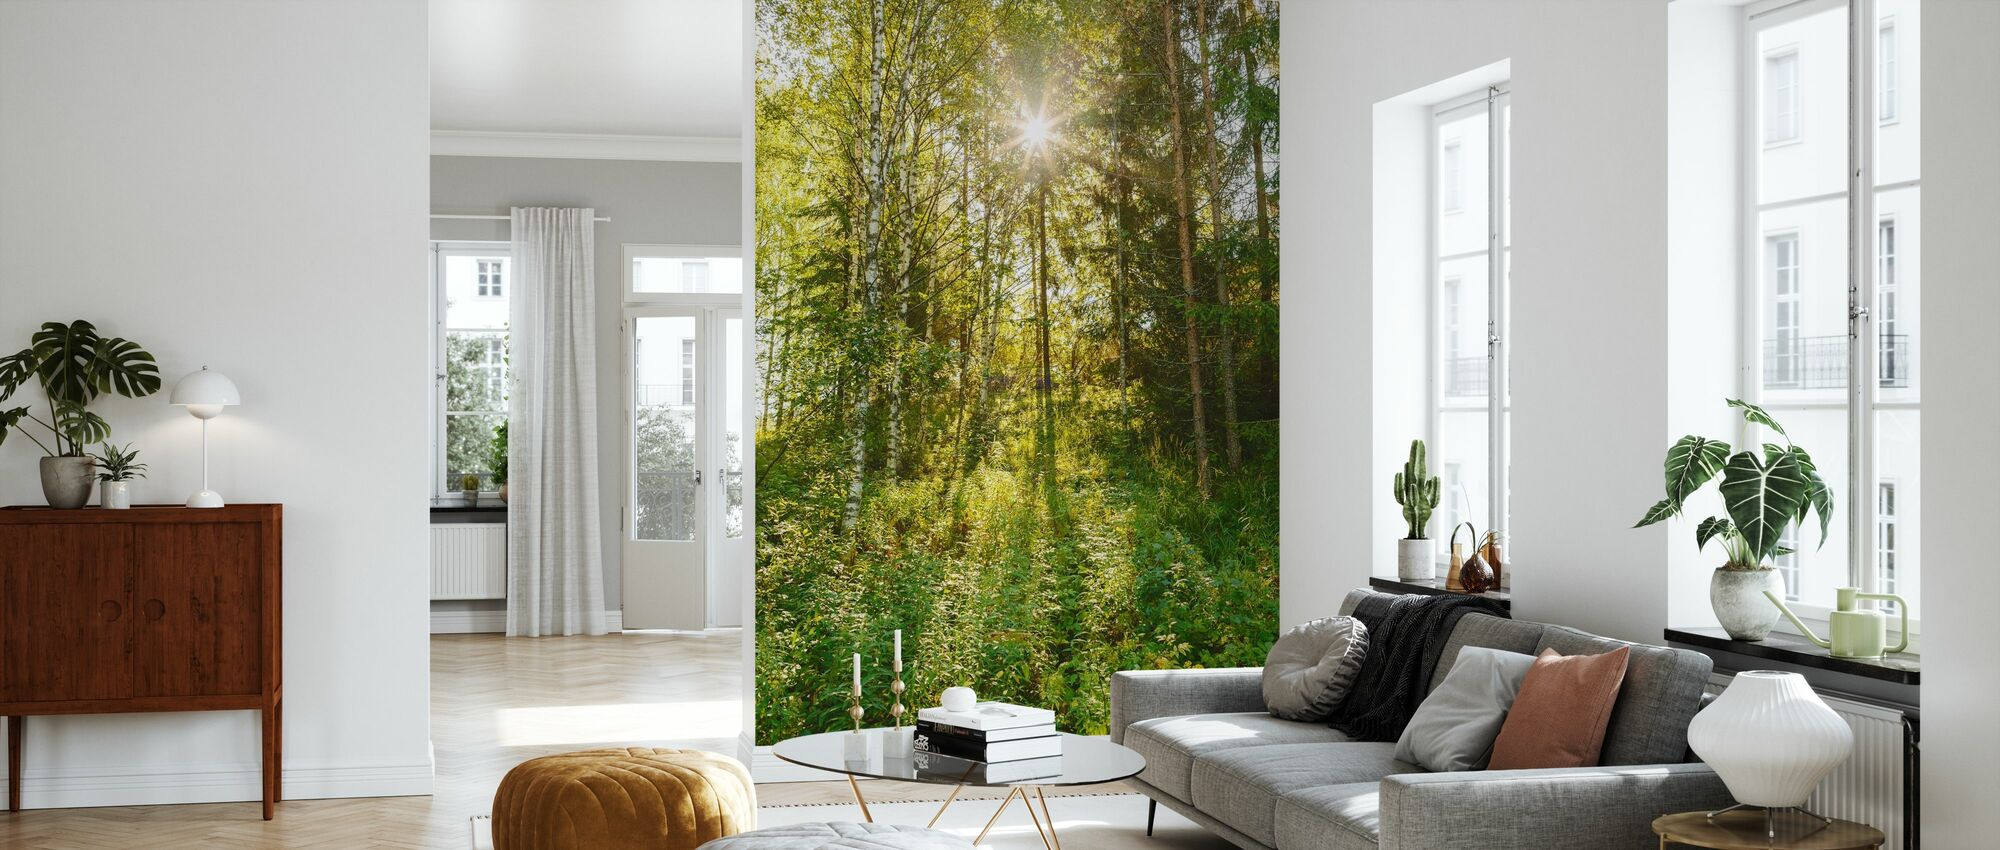 Sunlit Deciduous Trees, Finland - Wallpaper - Living Room